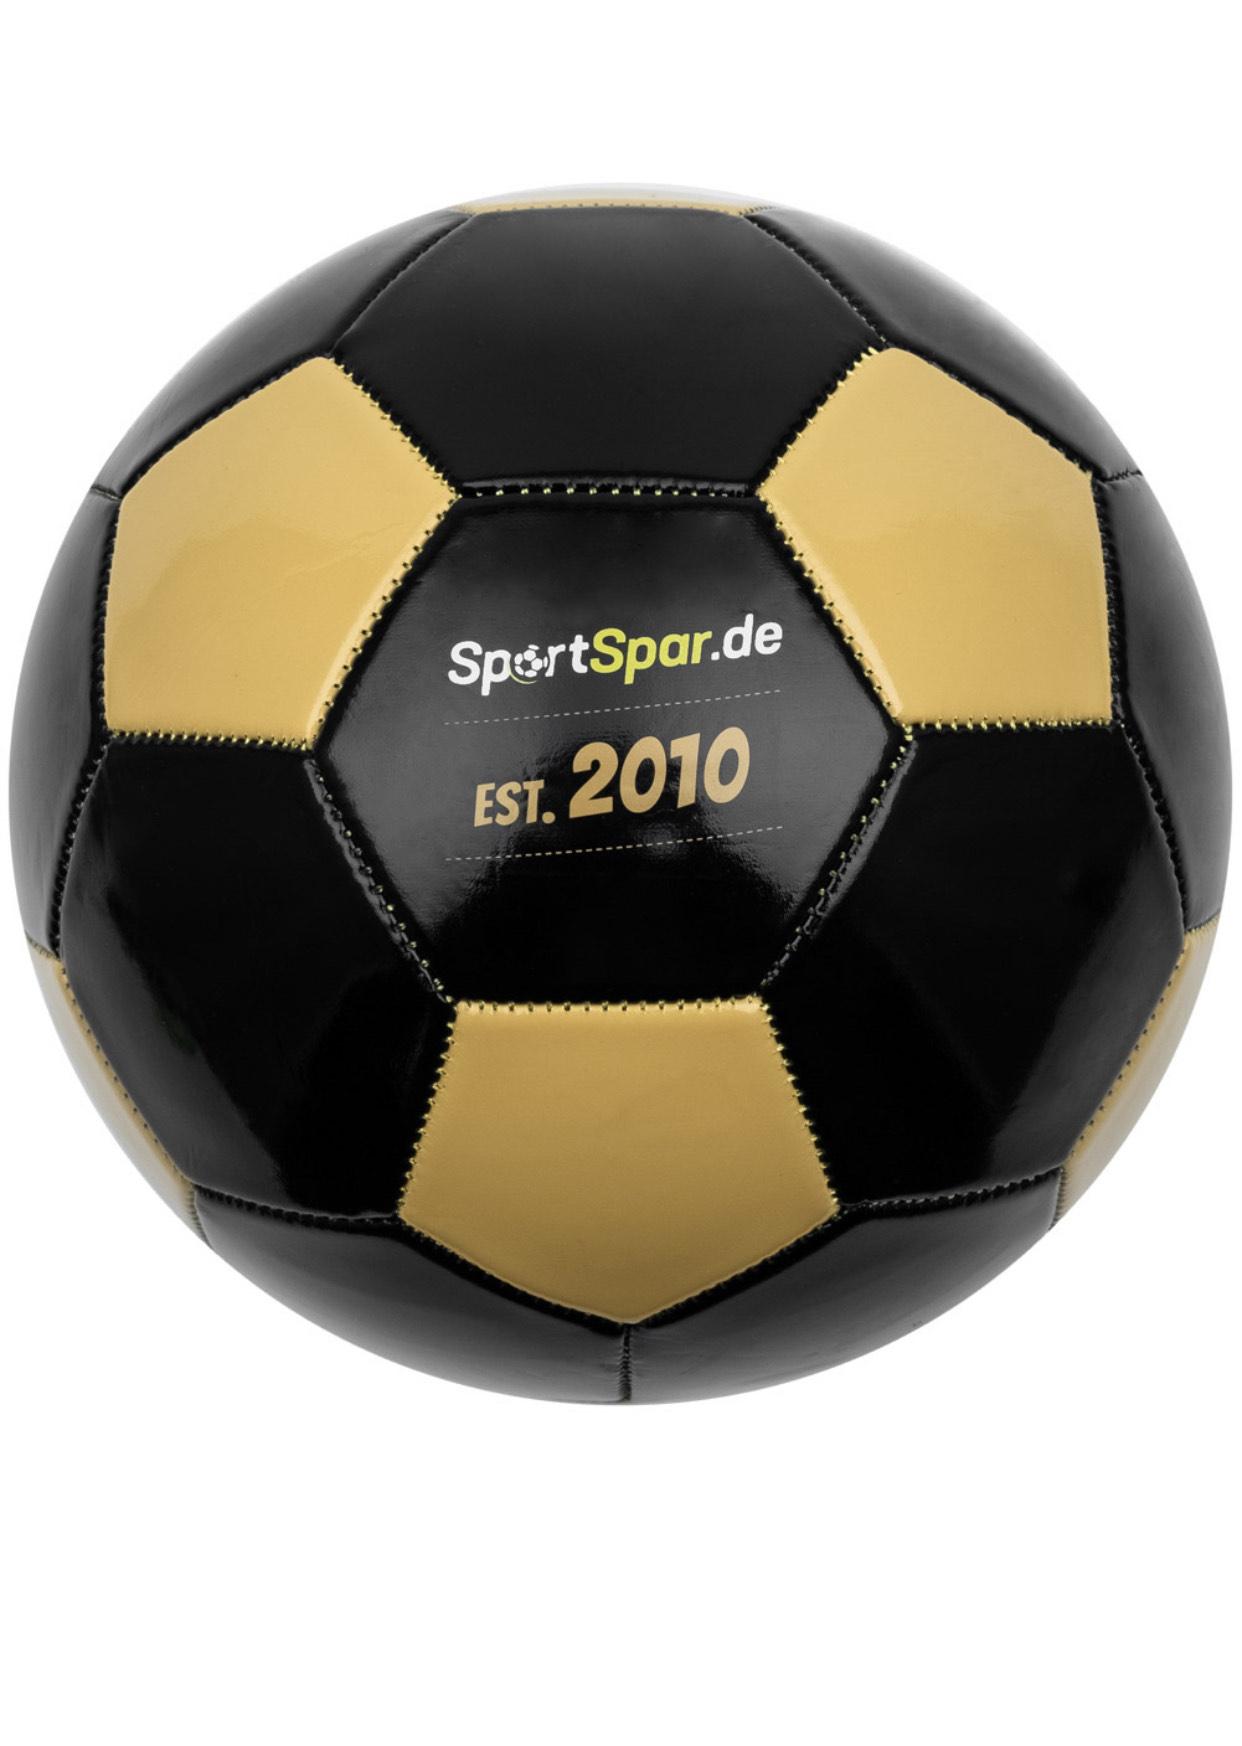 "Sportspar.de ""Limited Edition 10 Jahre"" Fußball"